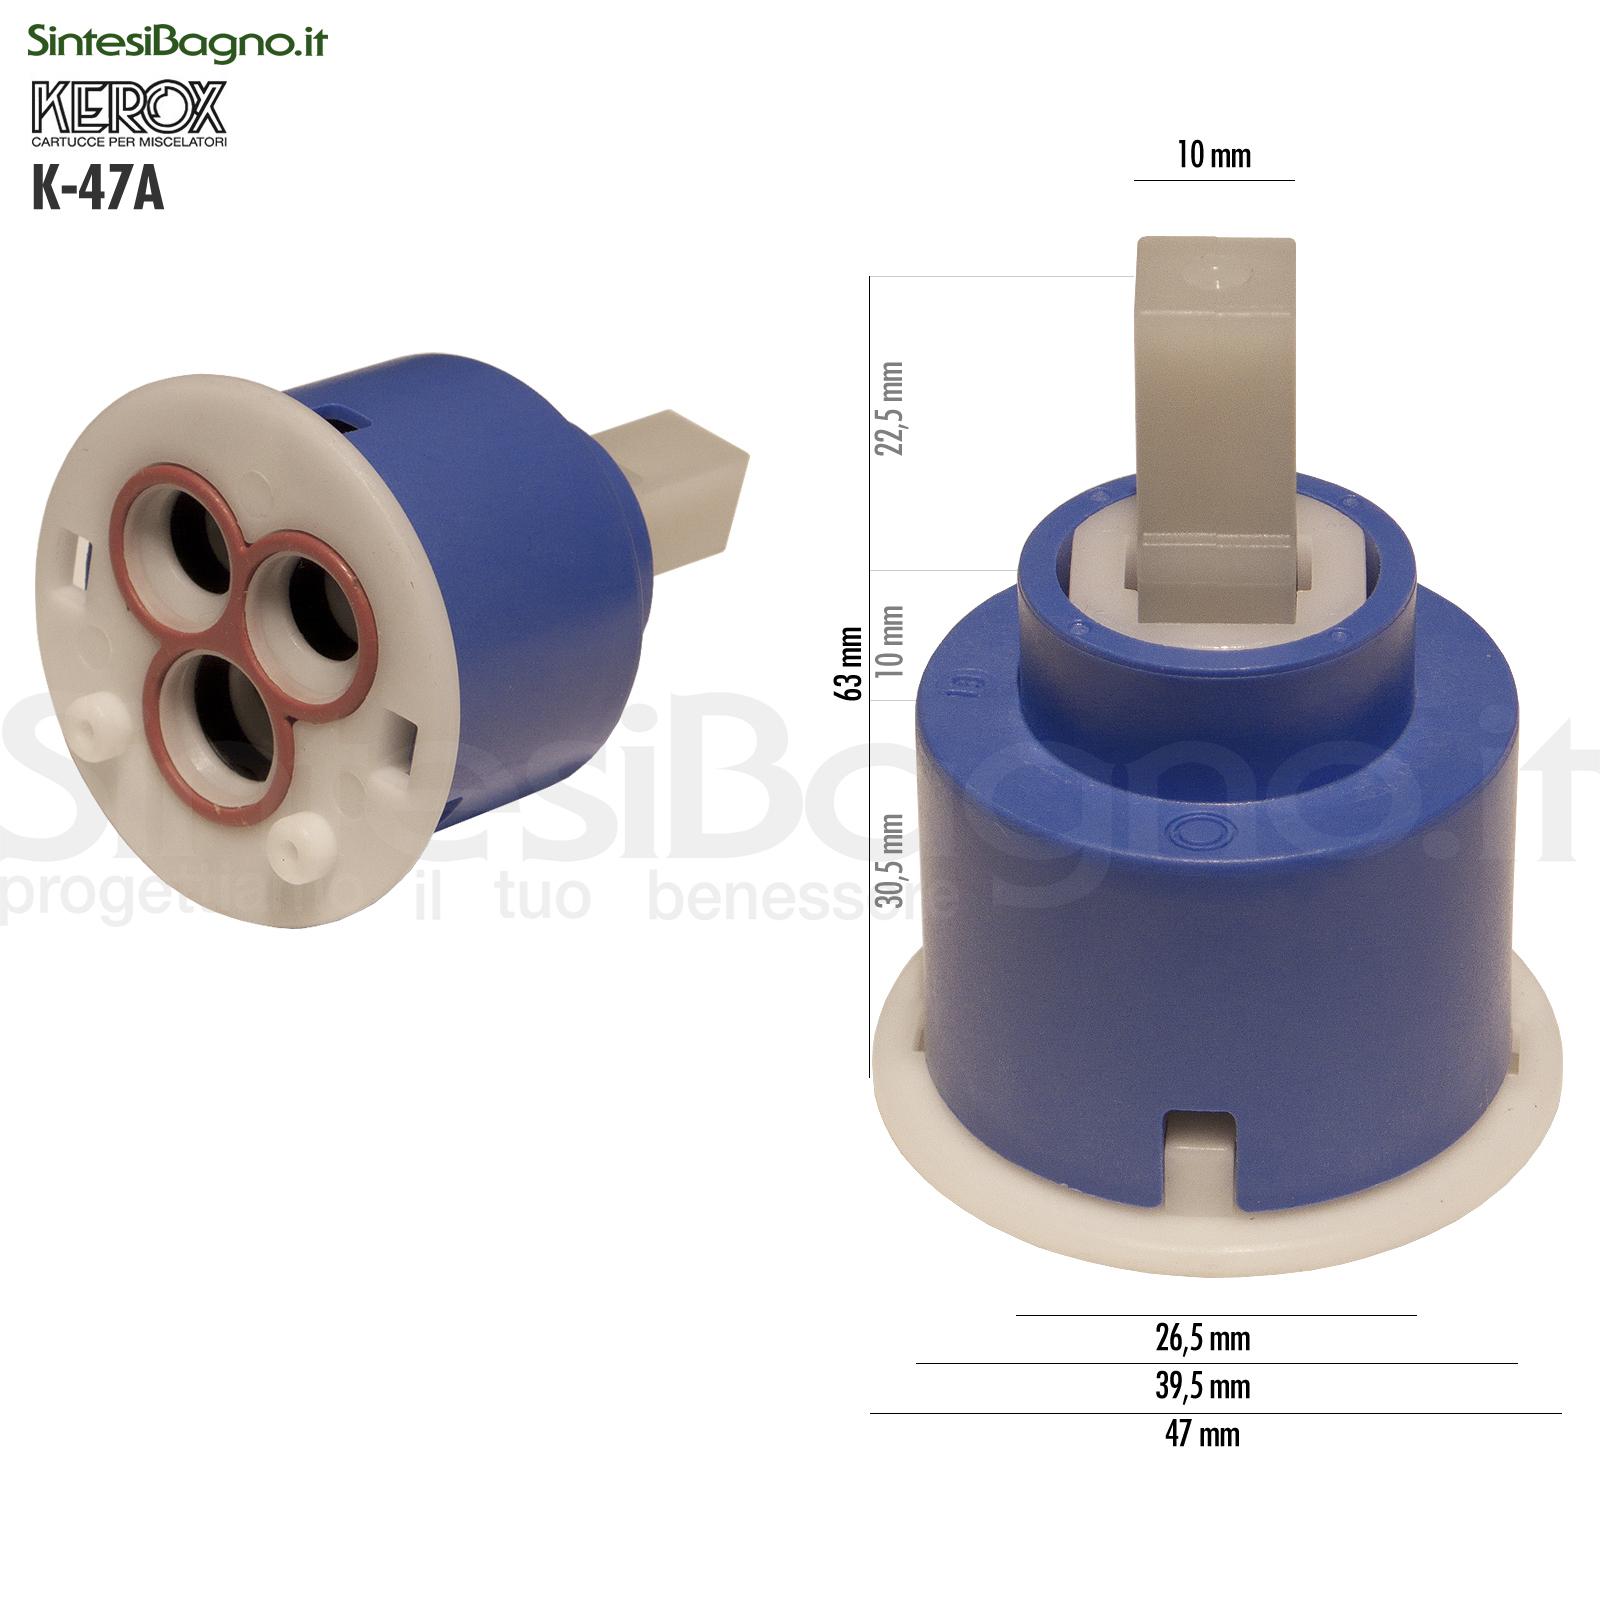 KEROX K 47 A | Cartuccia KEROX K-47A di ricambio per miscelatore monocomando Ø 47 mm